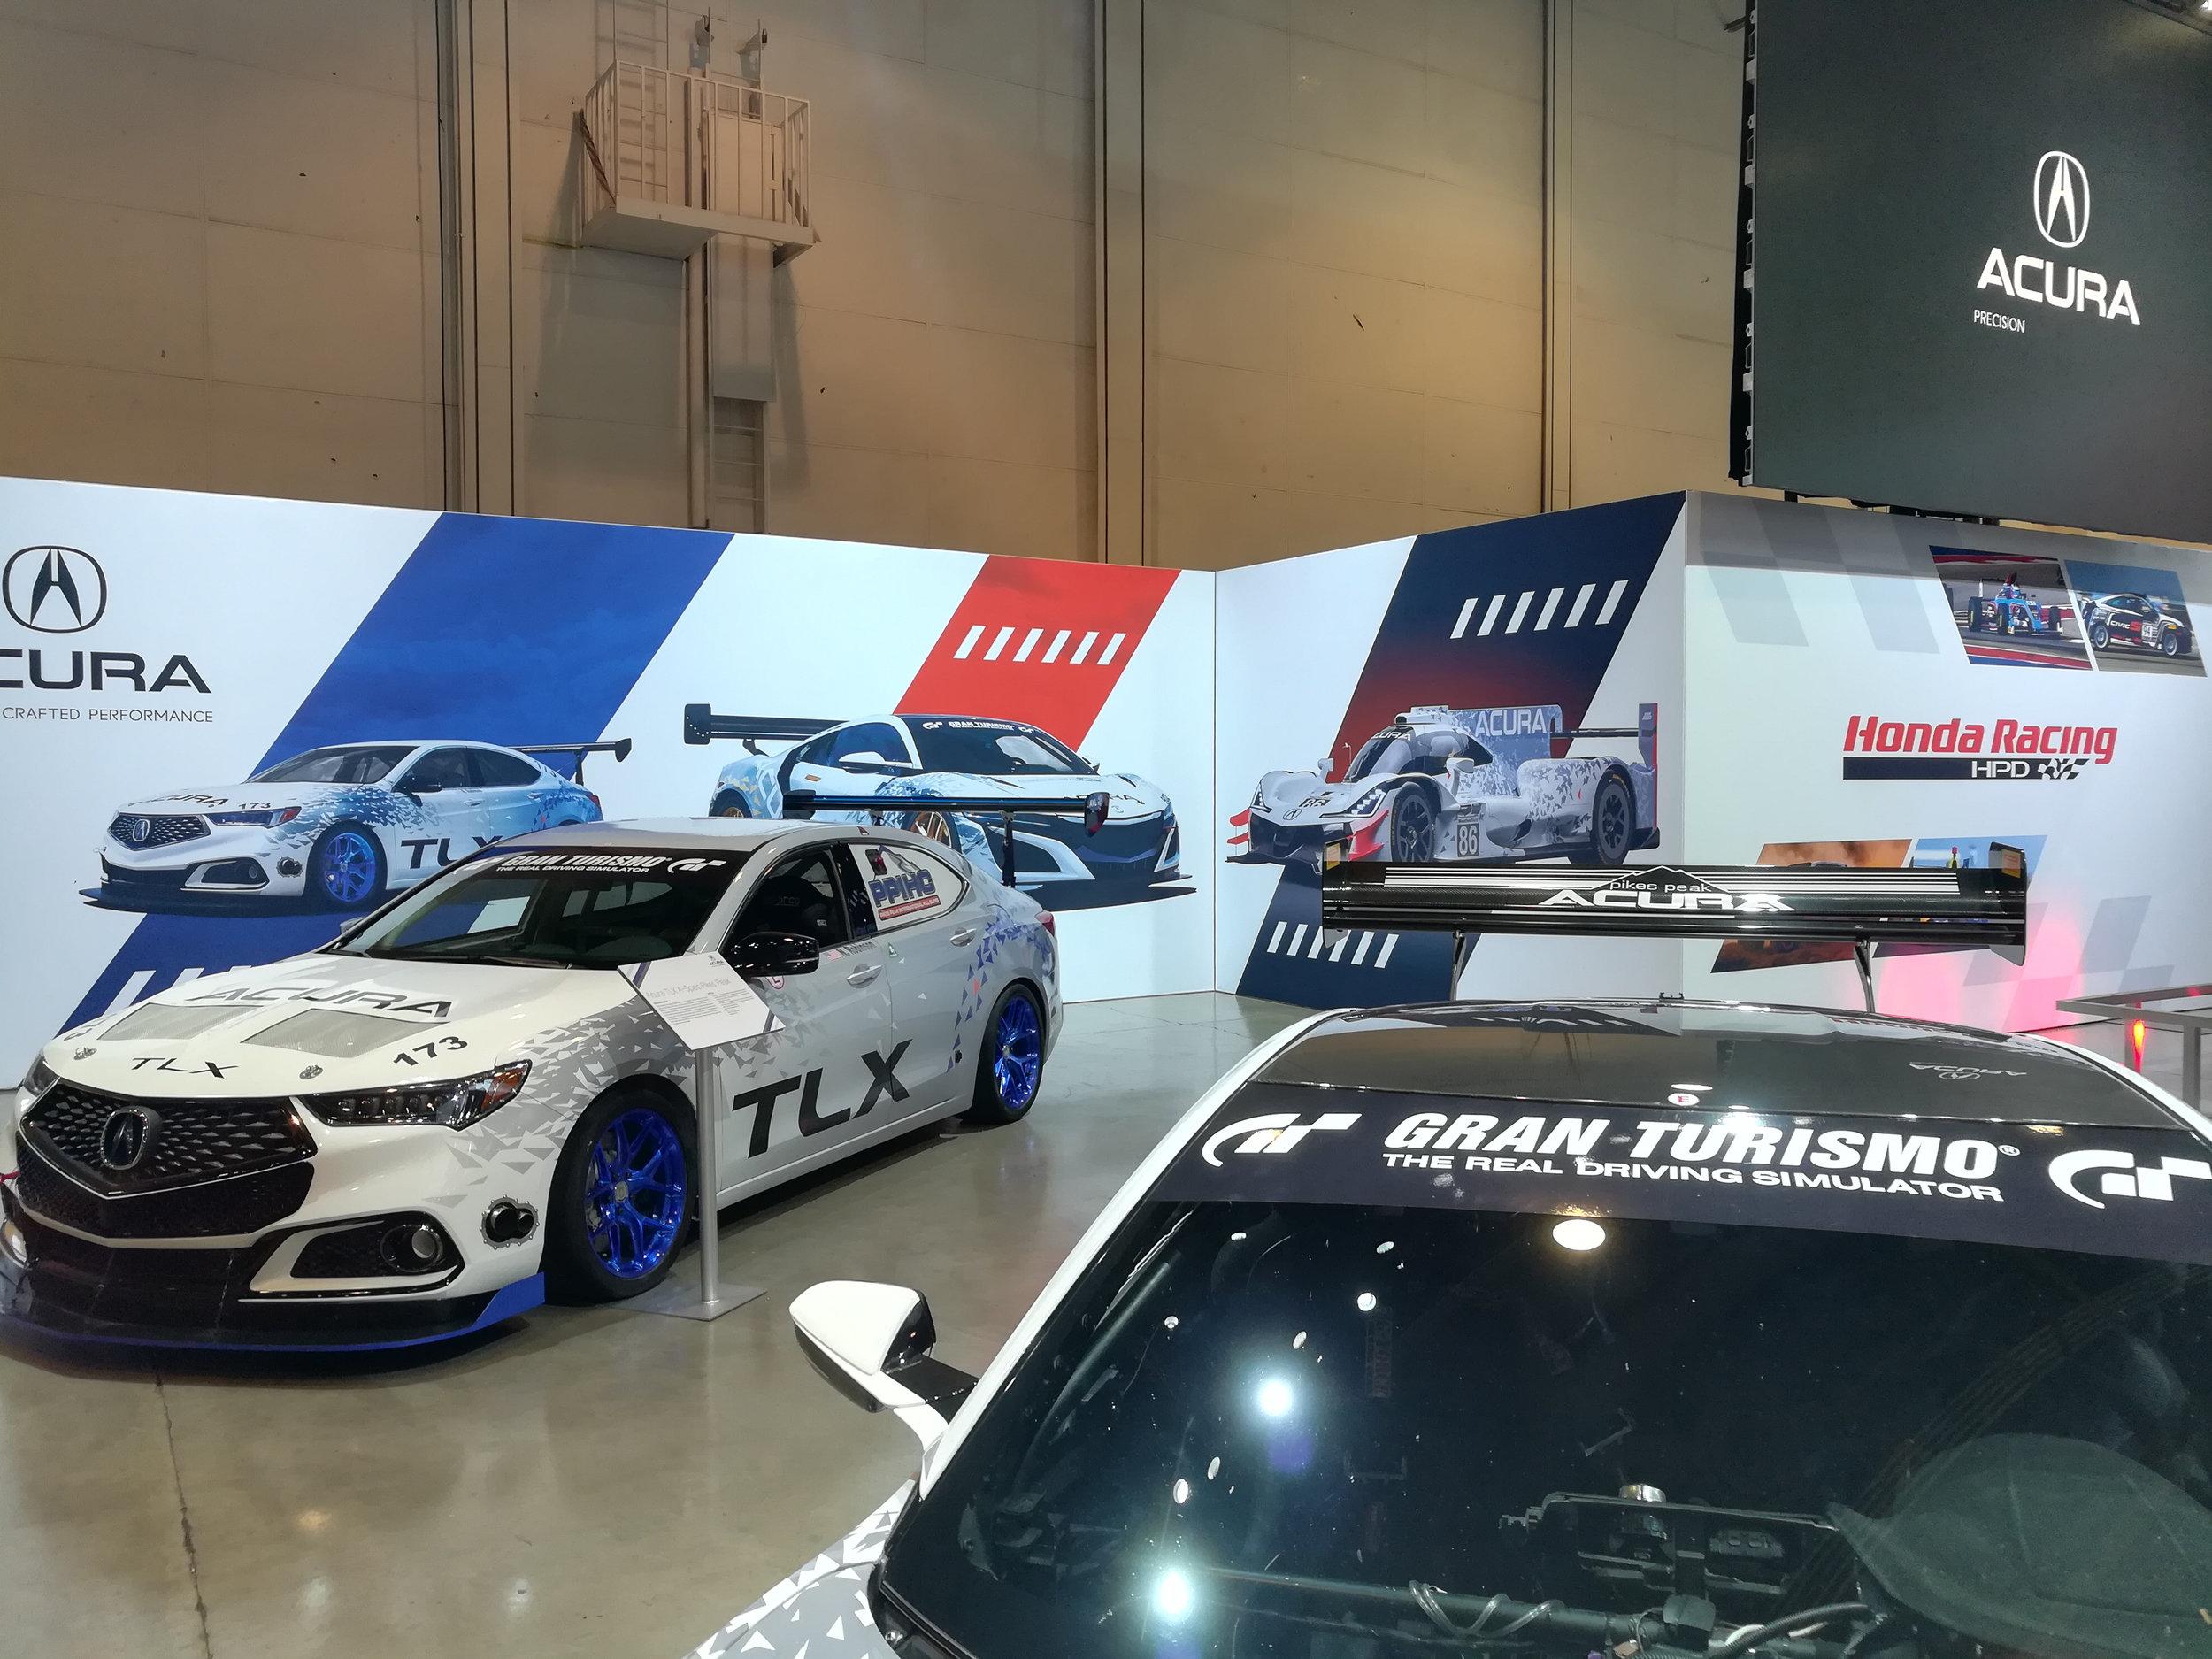 Acura Racing Area, Honda+Acura & GPJ, 2017